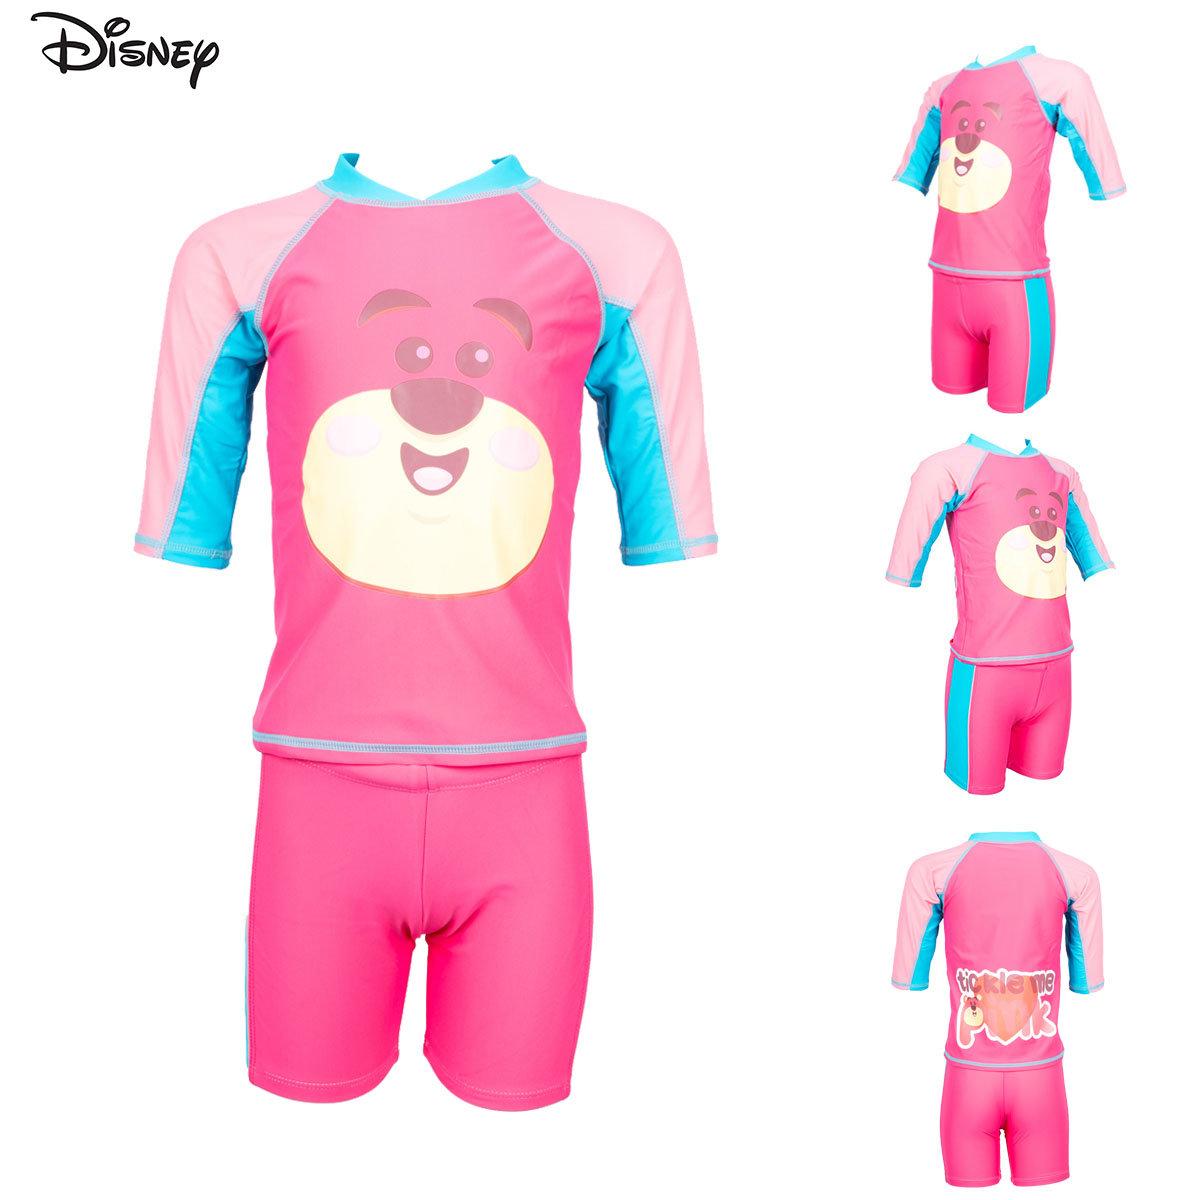 949661b2b3 Disney | Kids Swimming Rash Guard-Three-quarter Sleeve (Toy Story 3 ...